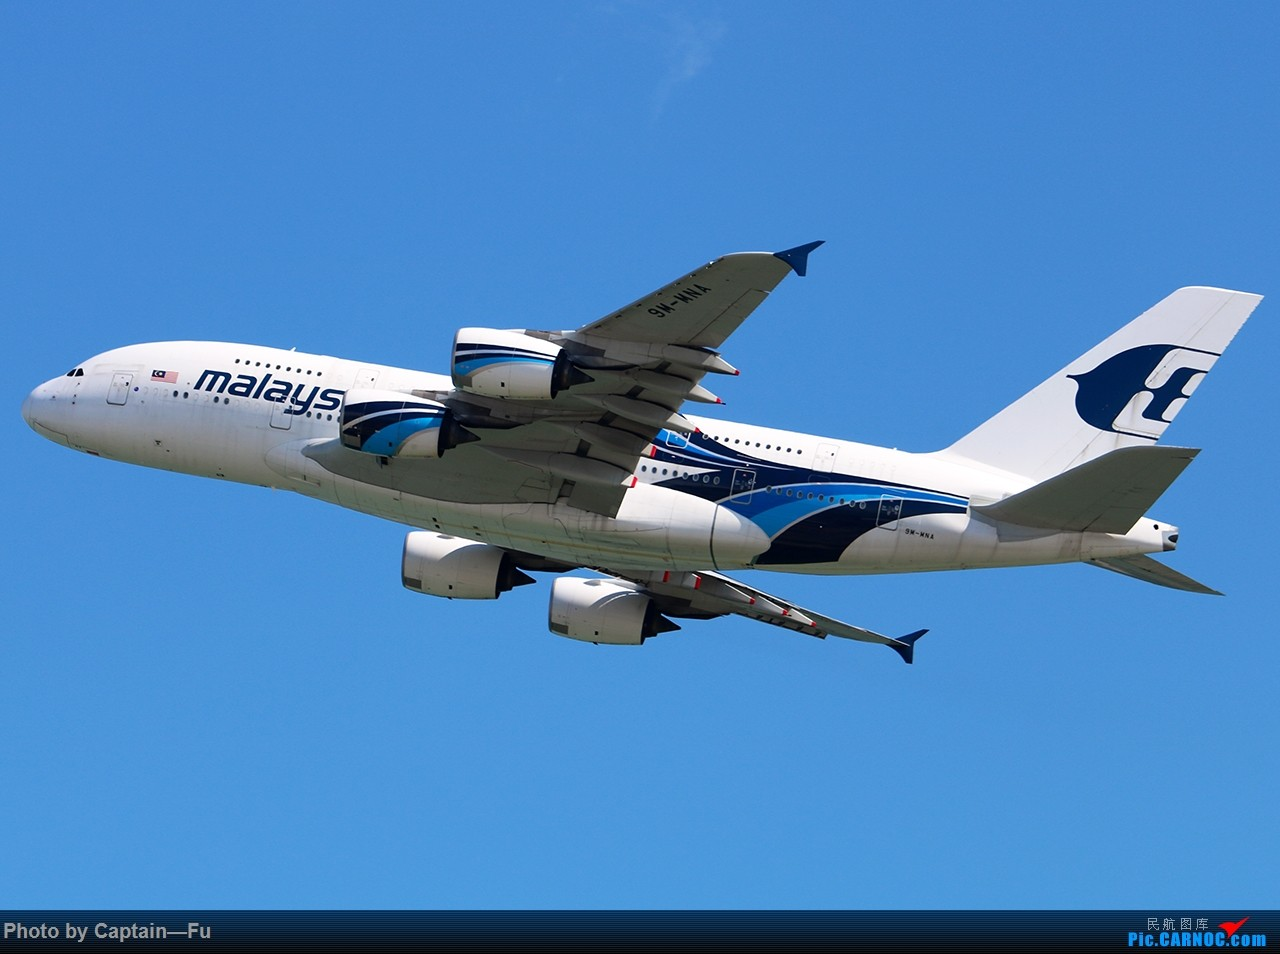 Re:[原创]香港拍机 AIRBUS A380-800 9M-MNA 中国香港国际机场